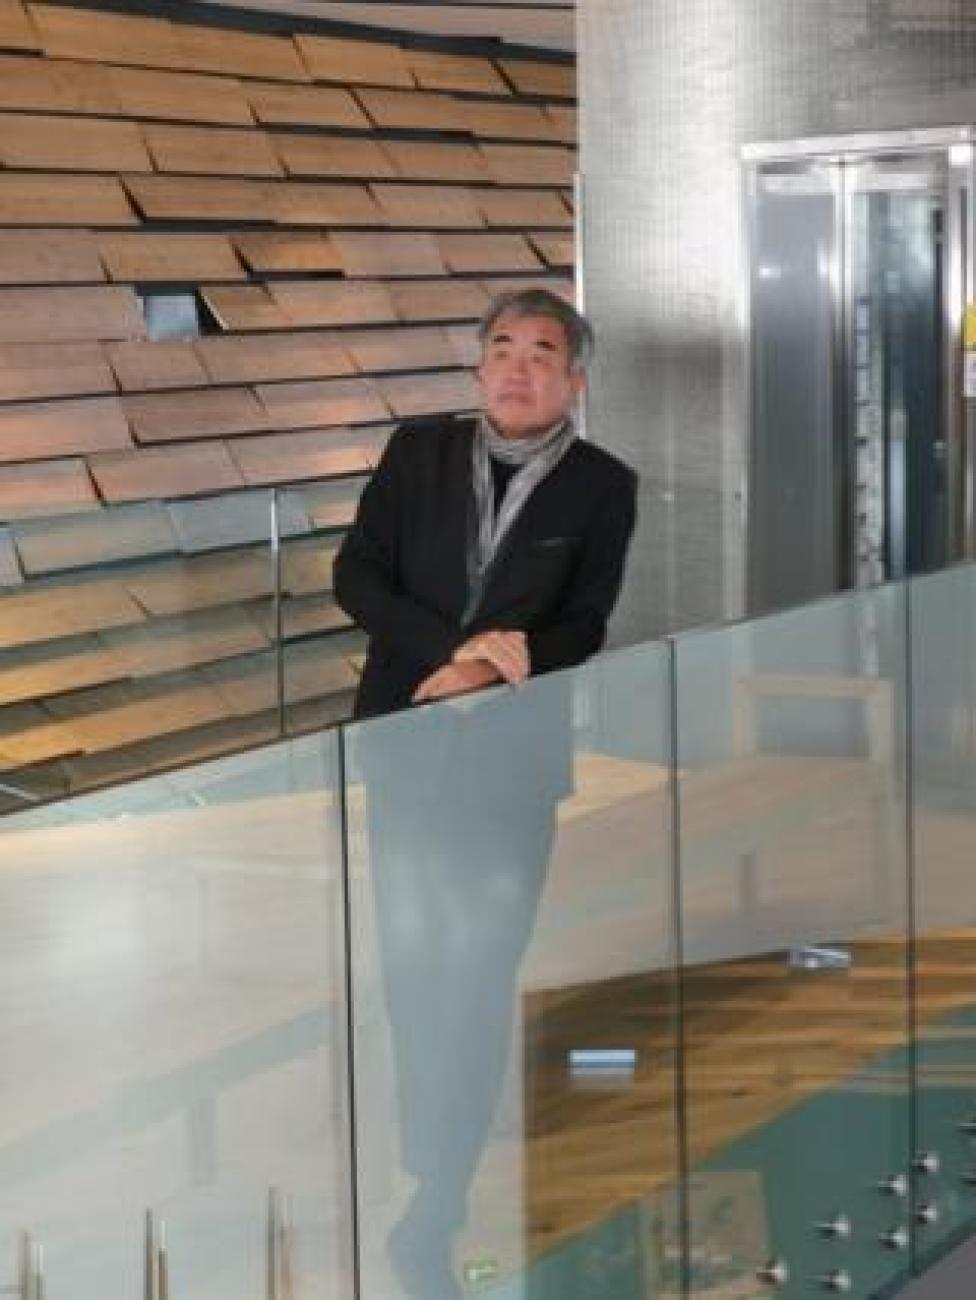 Japanese architect Kengo Kuma at the opening of his new museum